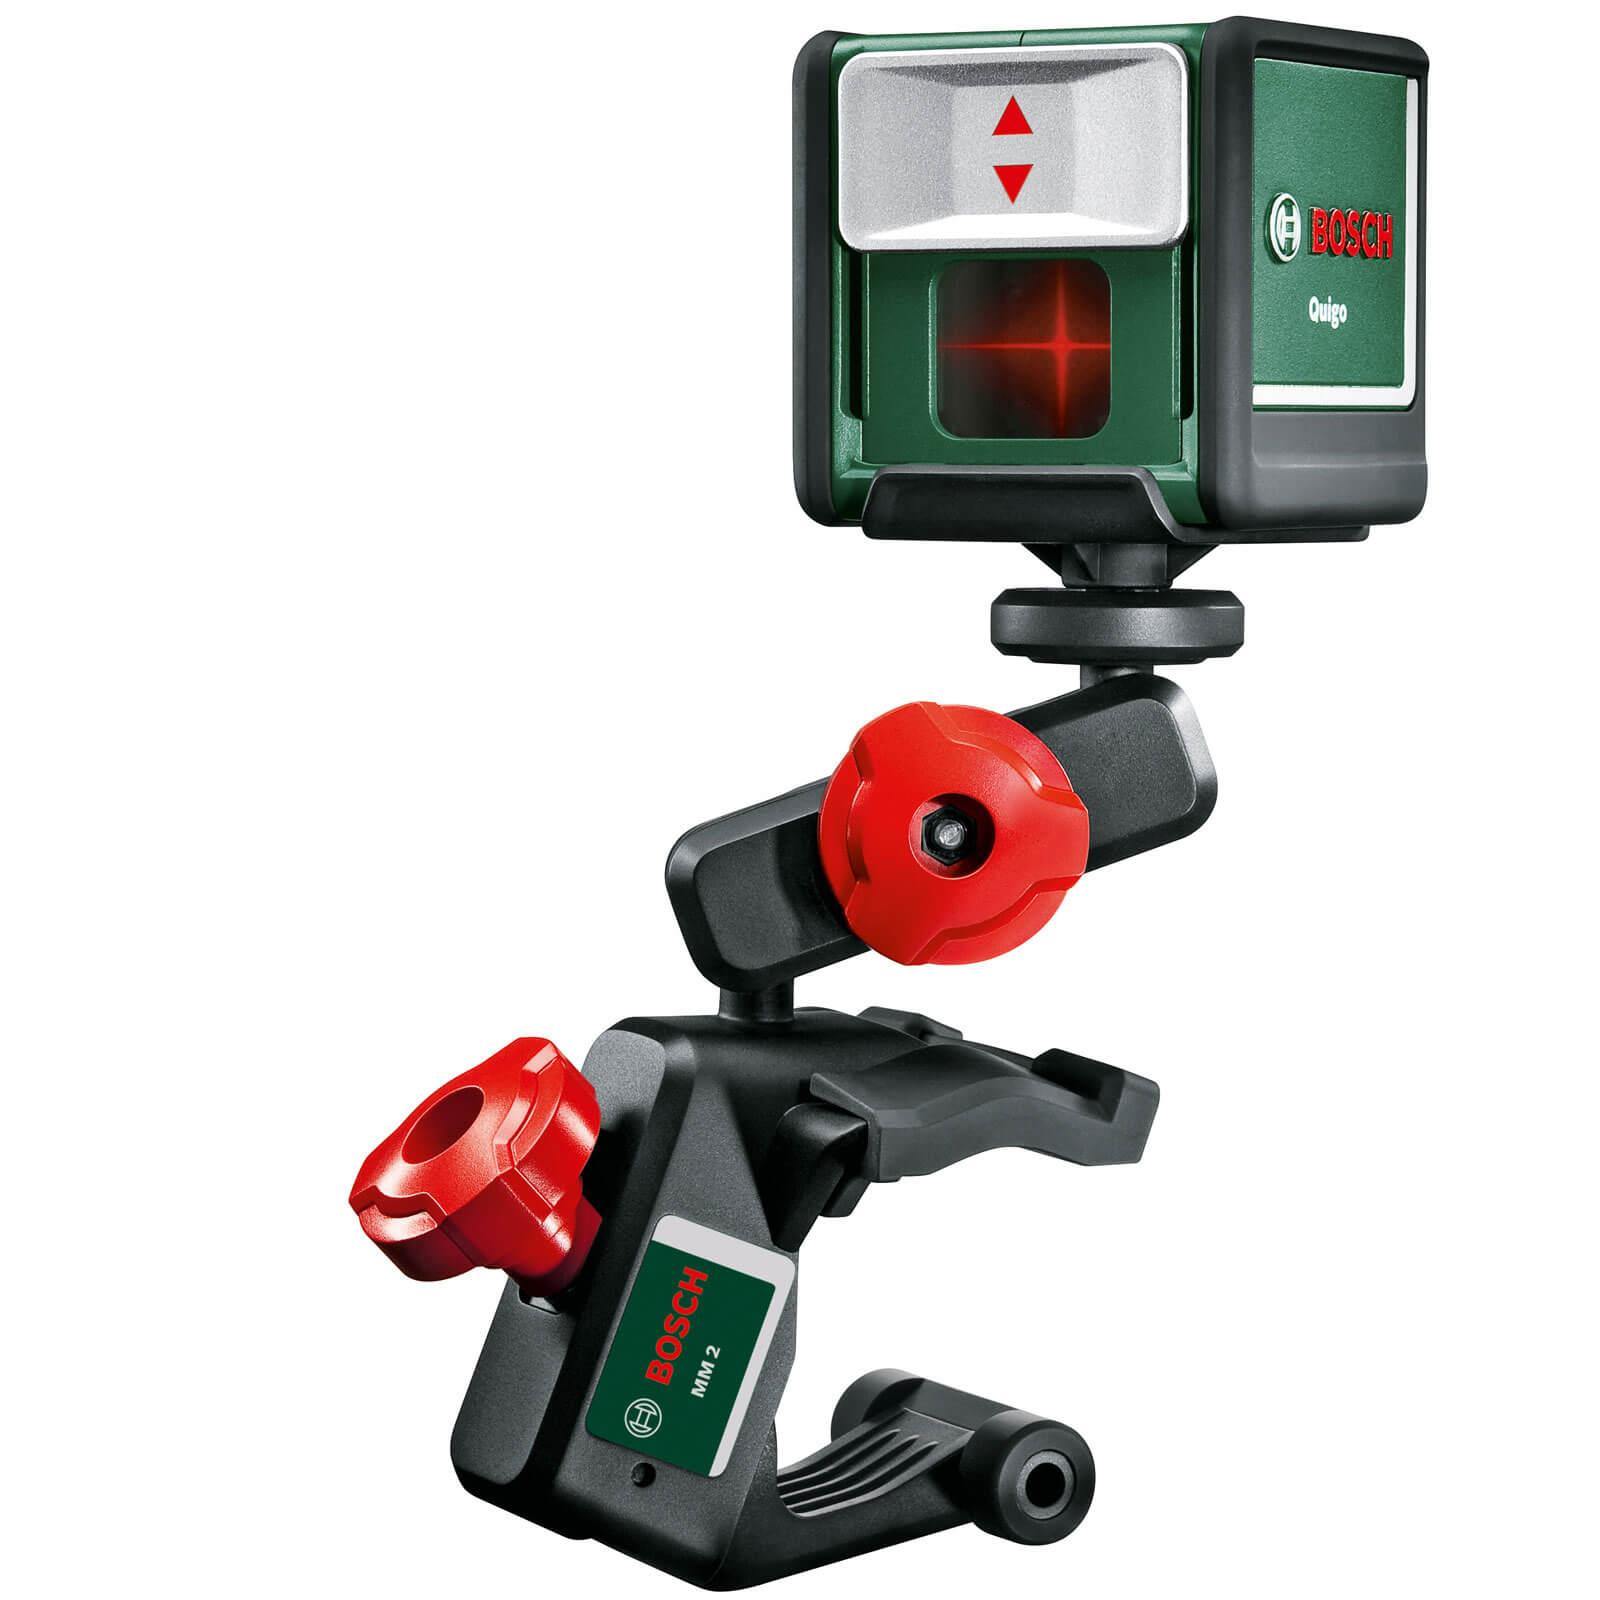 Bosch quigo 2 cross line laser for Niveau laser bosch quigo 2